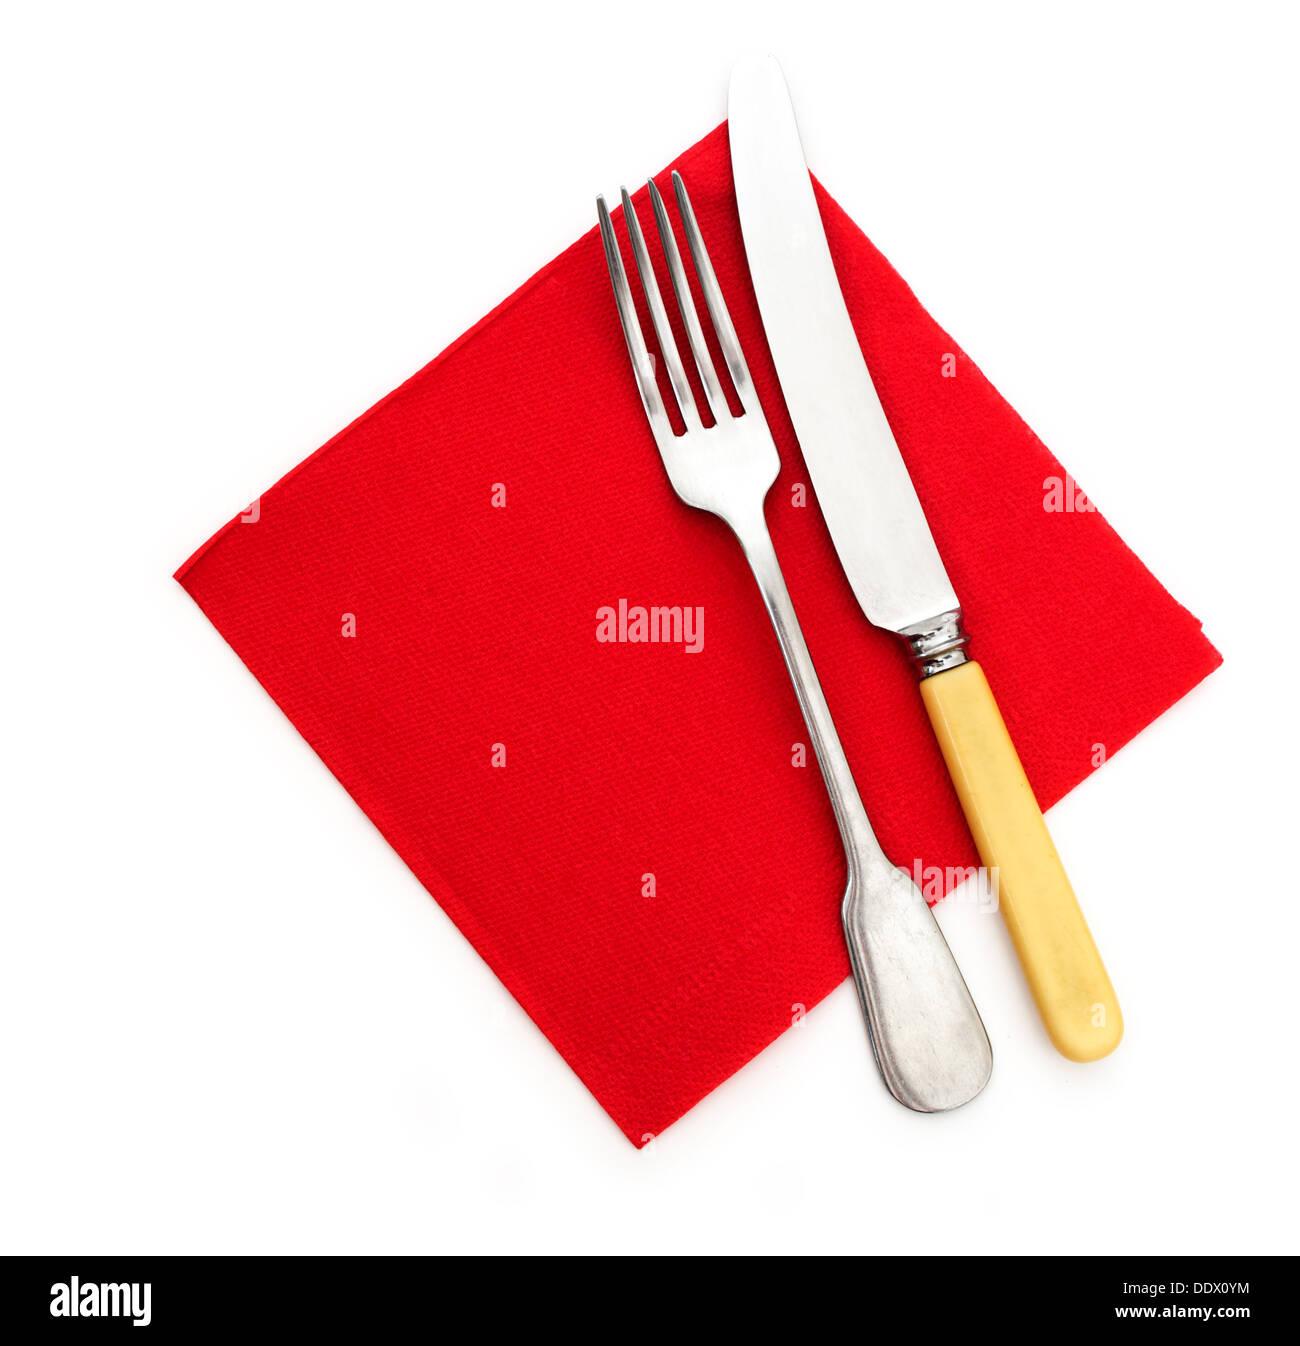 Ready for dinner - knife fork and red paper serviette, napkin - Stock Image